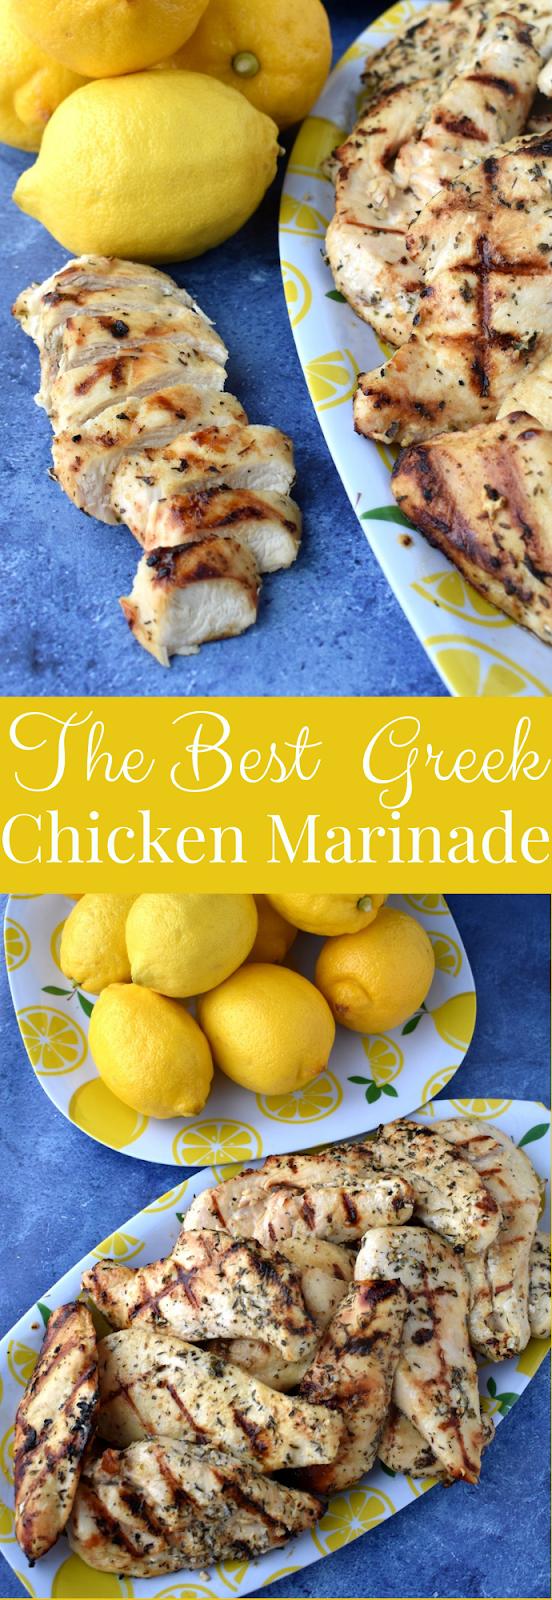 The Best Greek Lemon Chicken Marinade